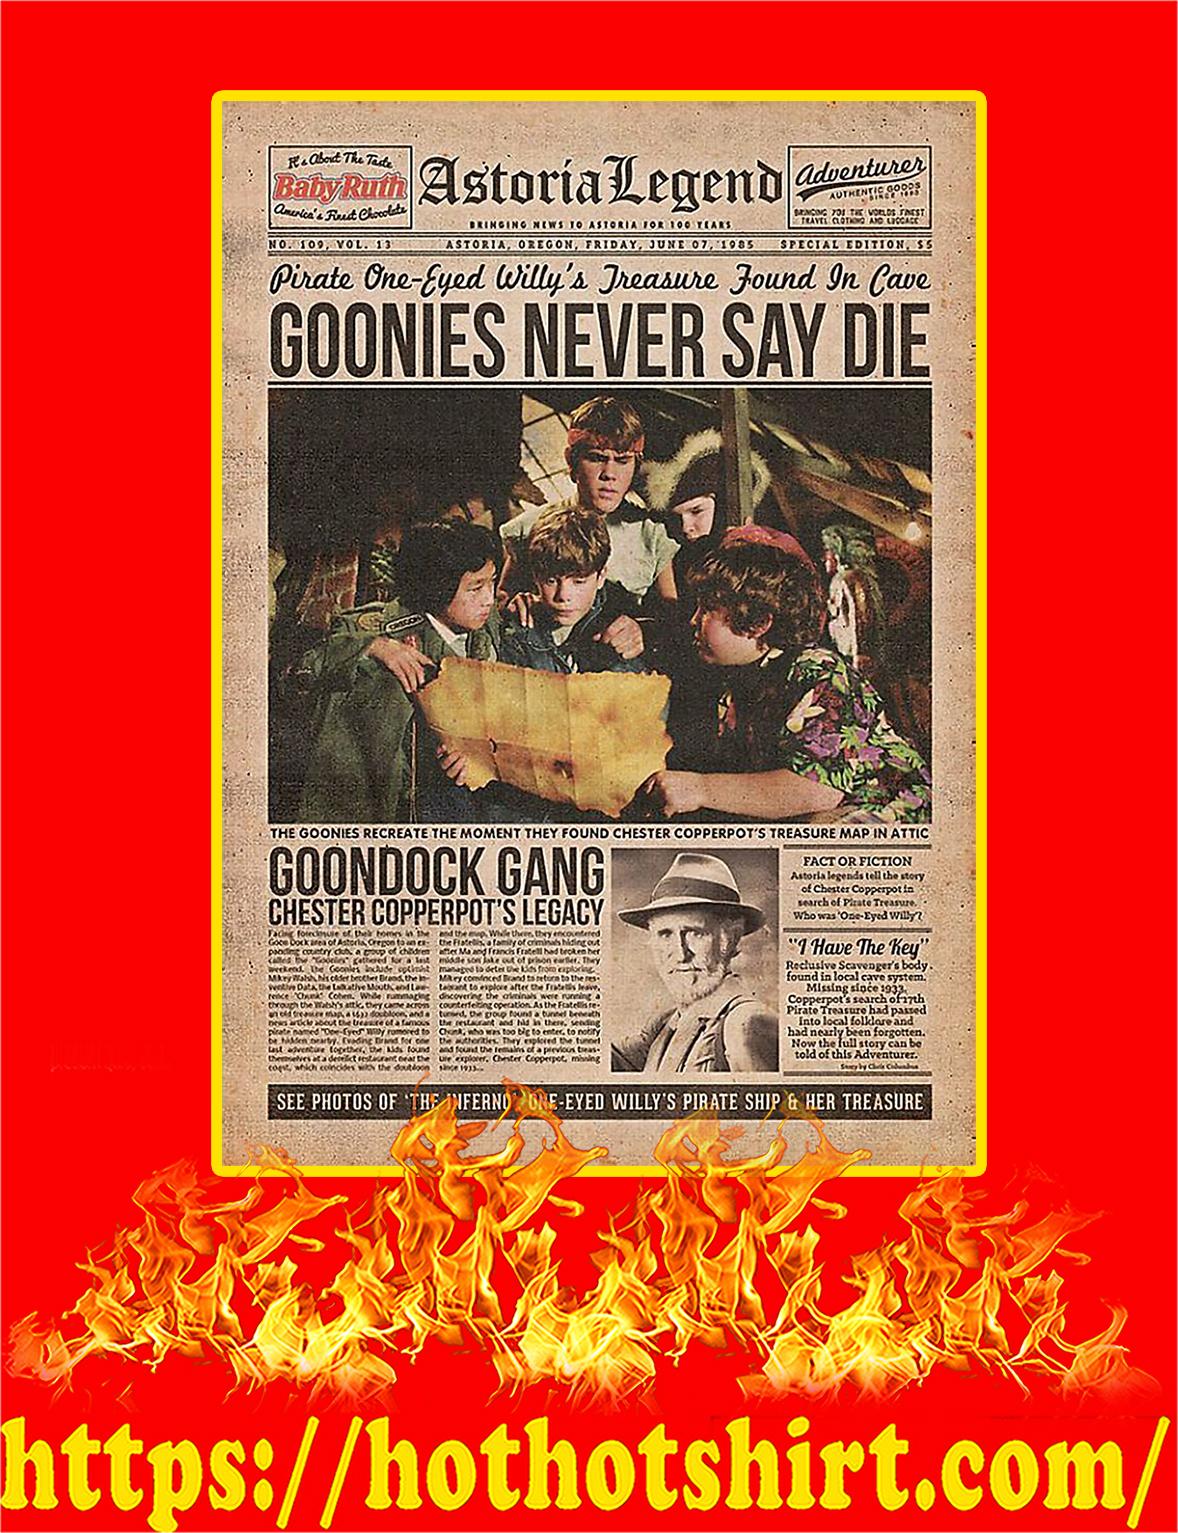 Goonies Never Say Die Poster - A4